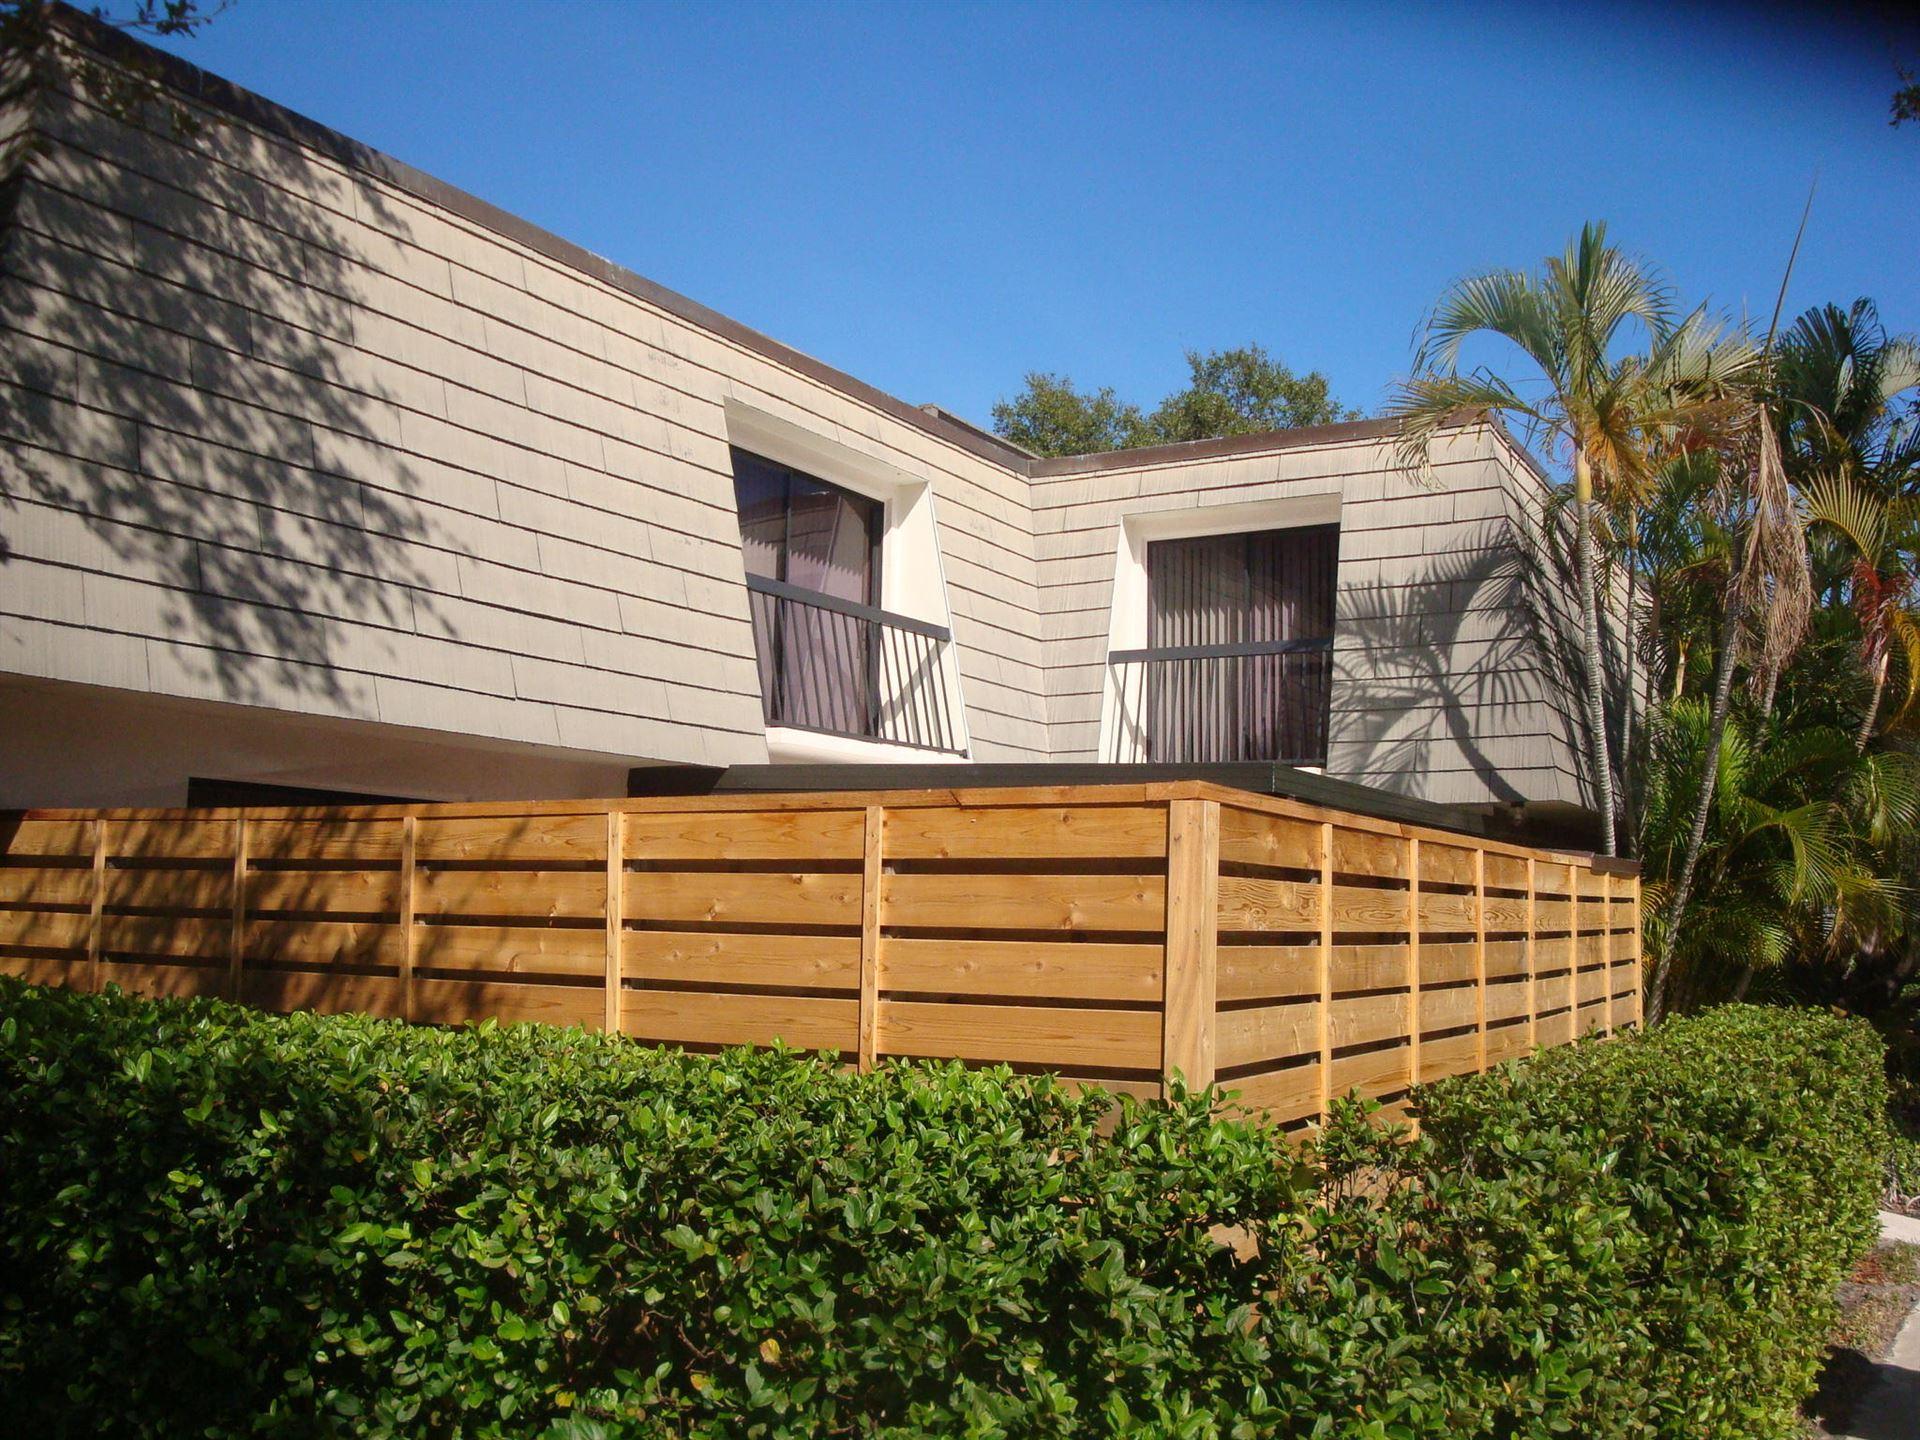 Photo of 1207 12th Terrace, Palm Beach Gardens, FL 33418 (MLS # RX-10686453)